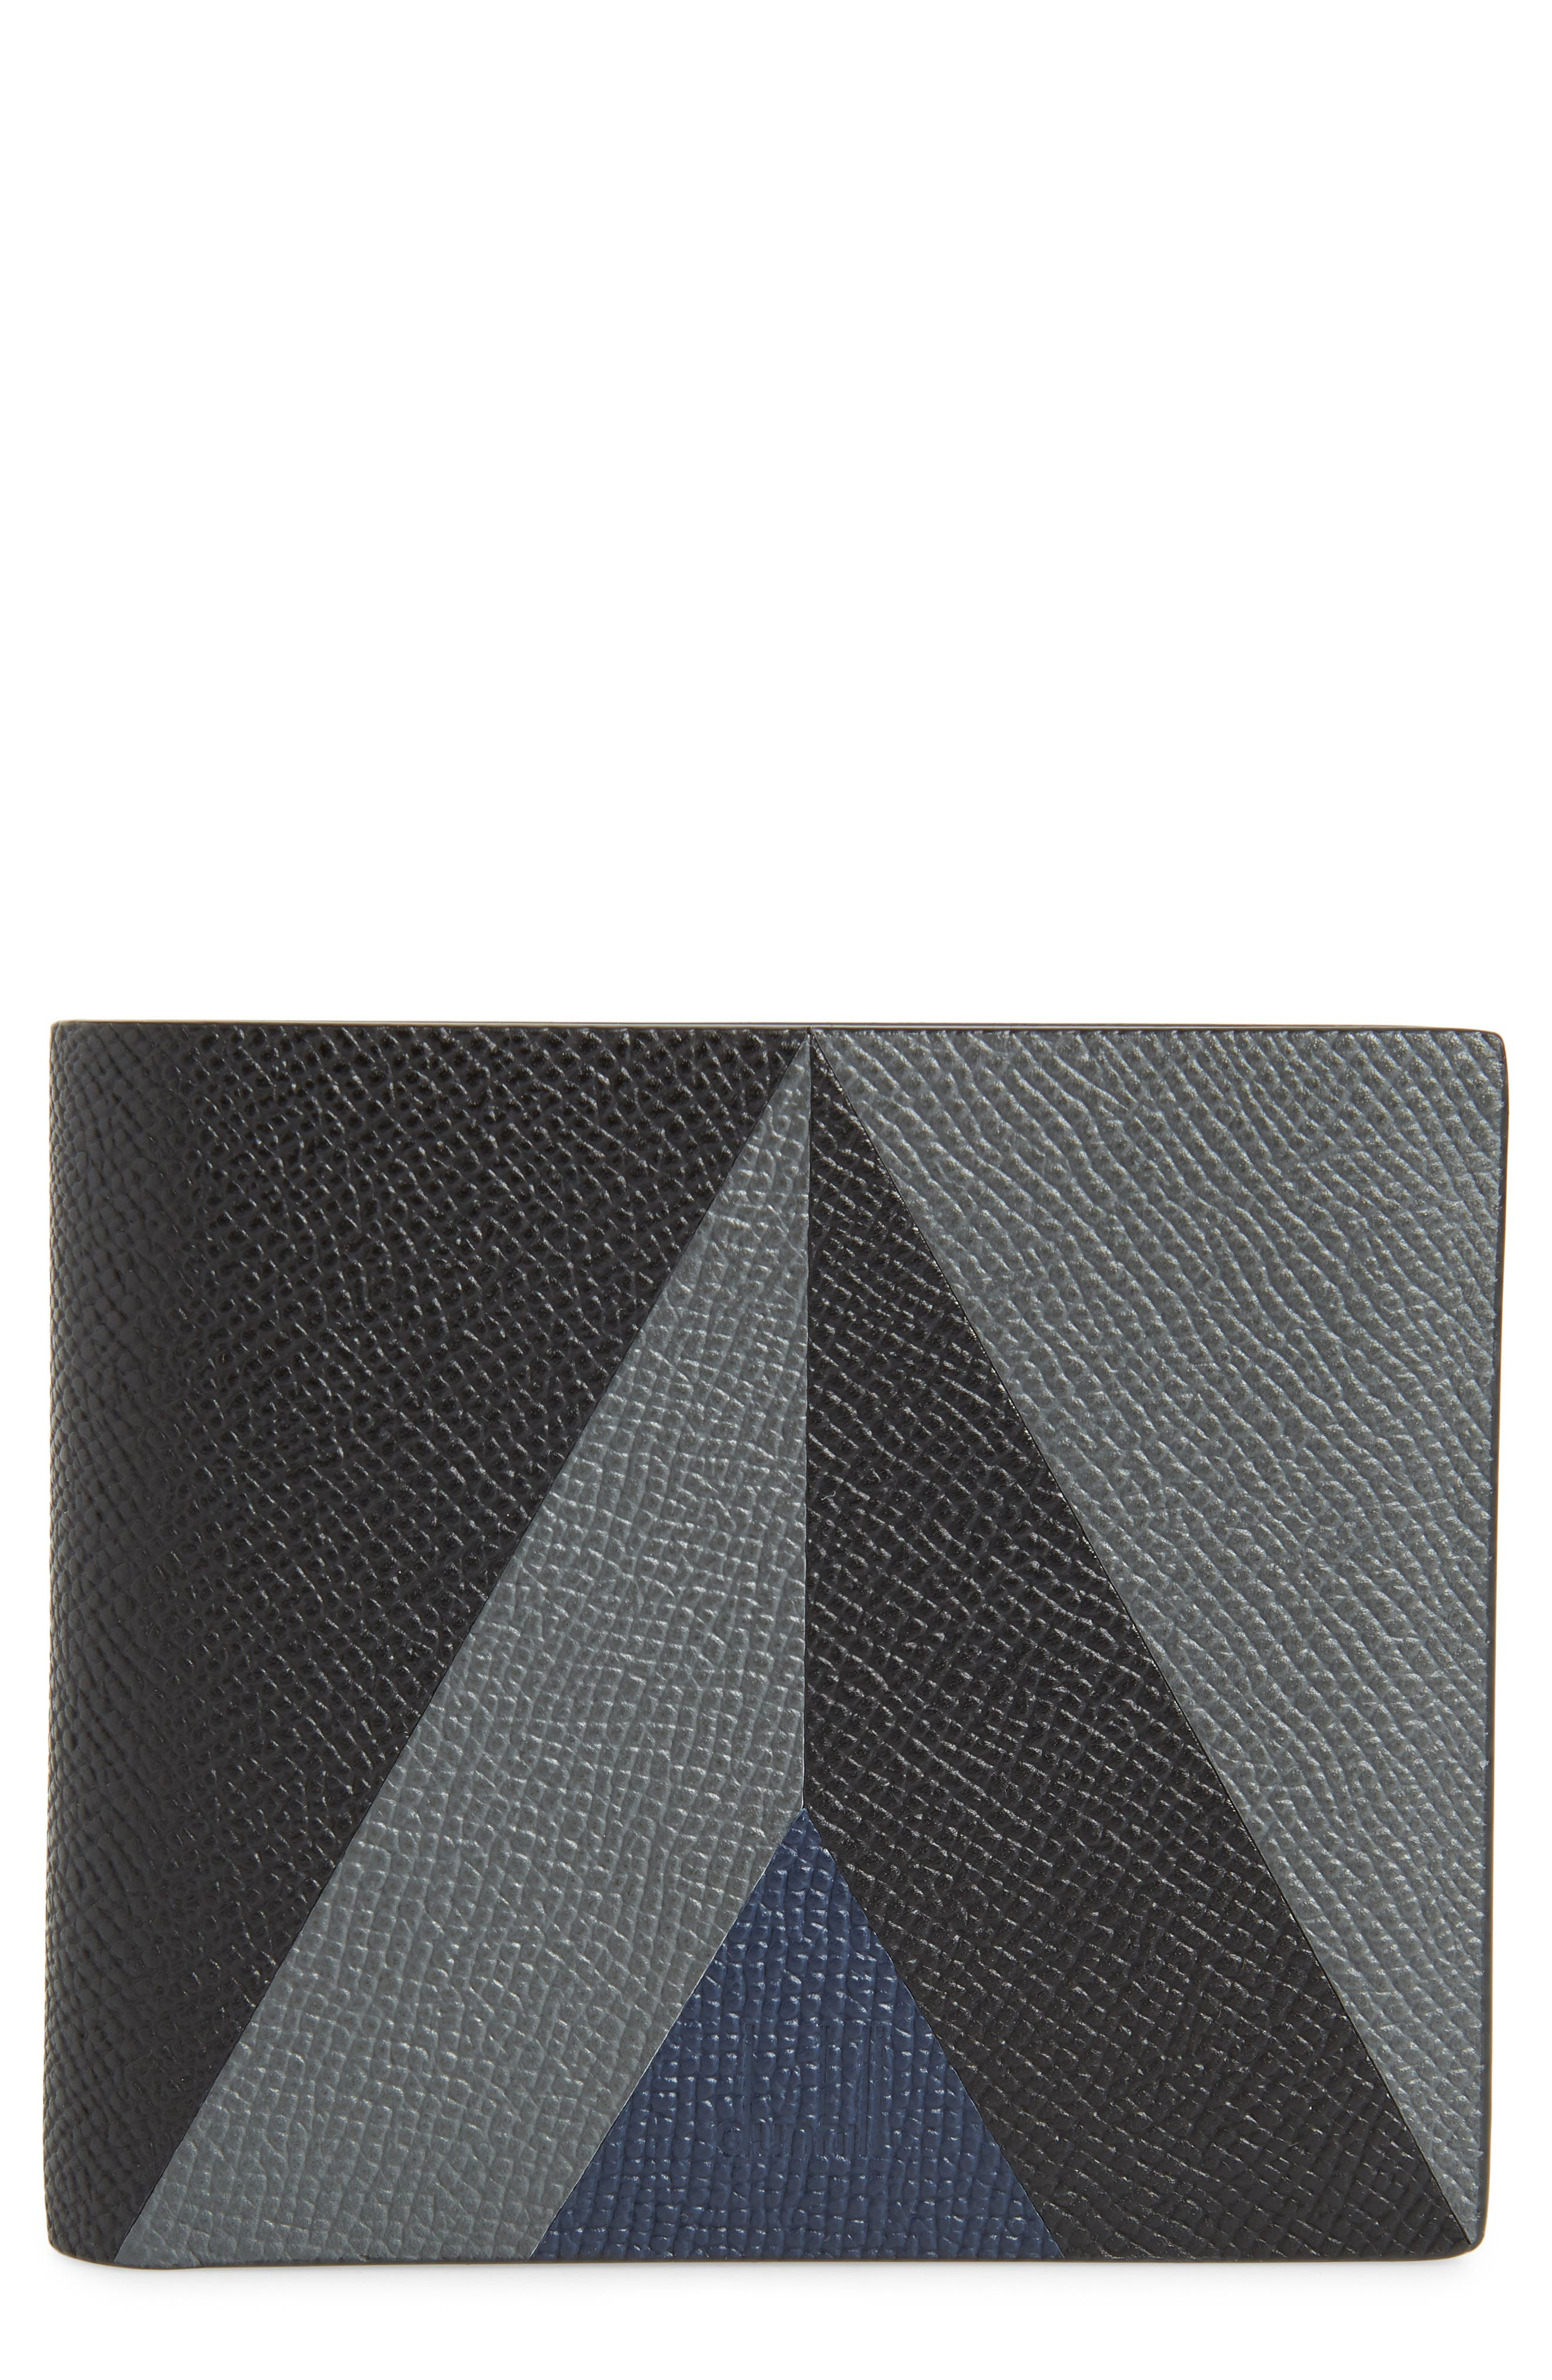 Cadogan Leather Wallet,                             Main thumbnail 1, color,                             BLACK